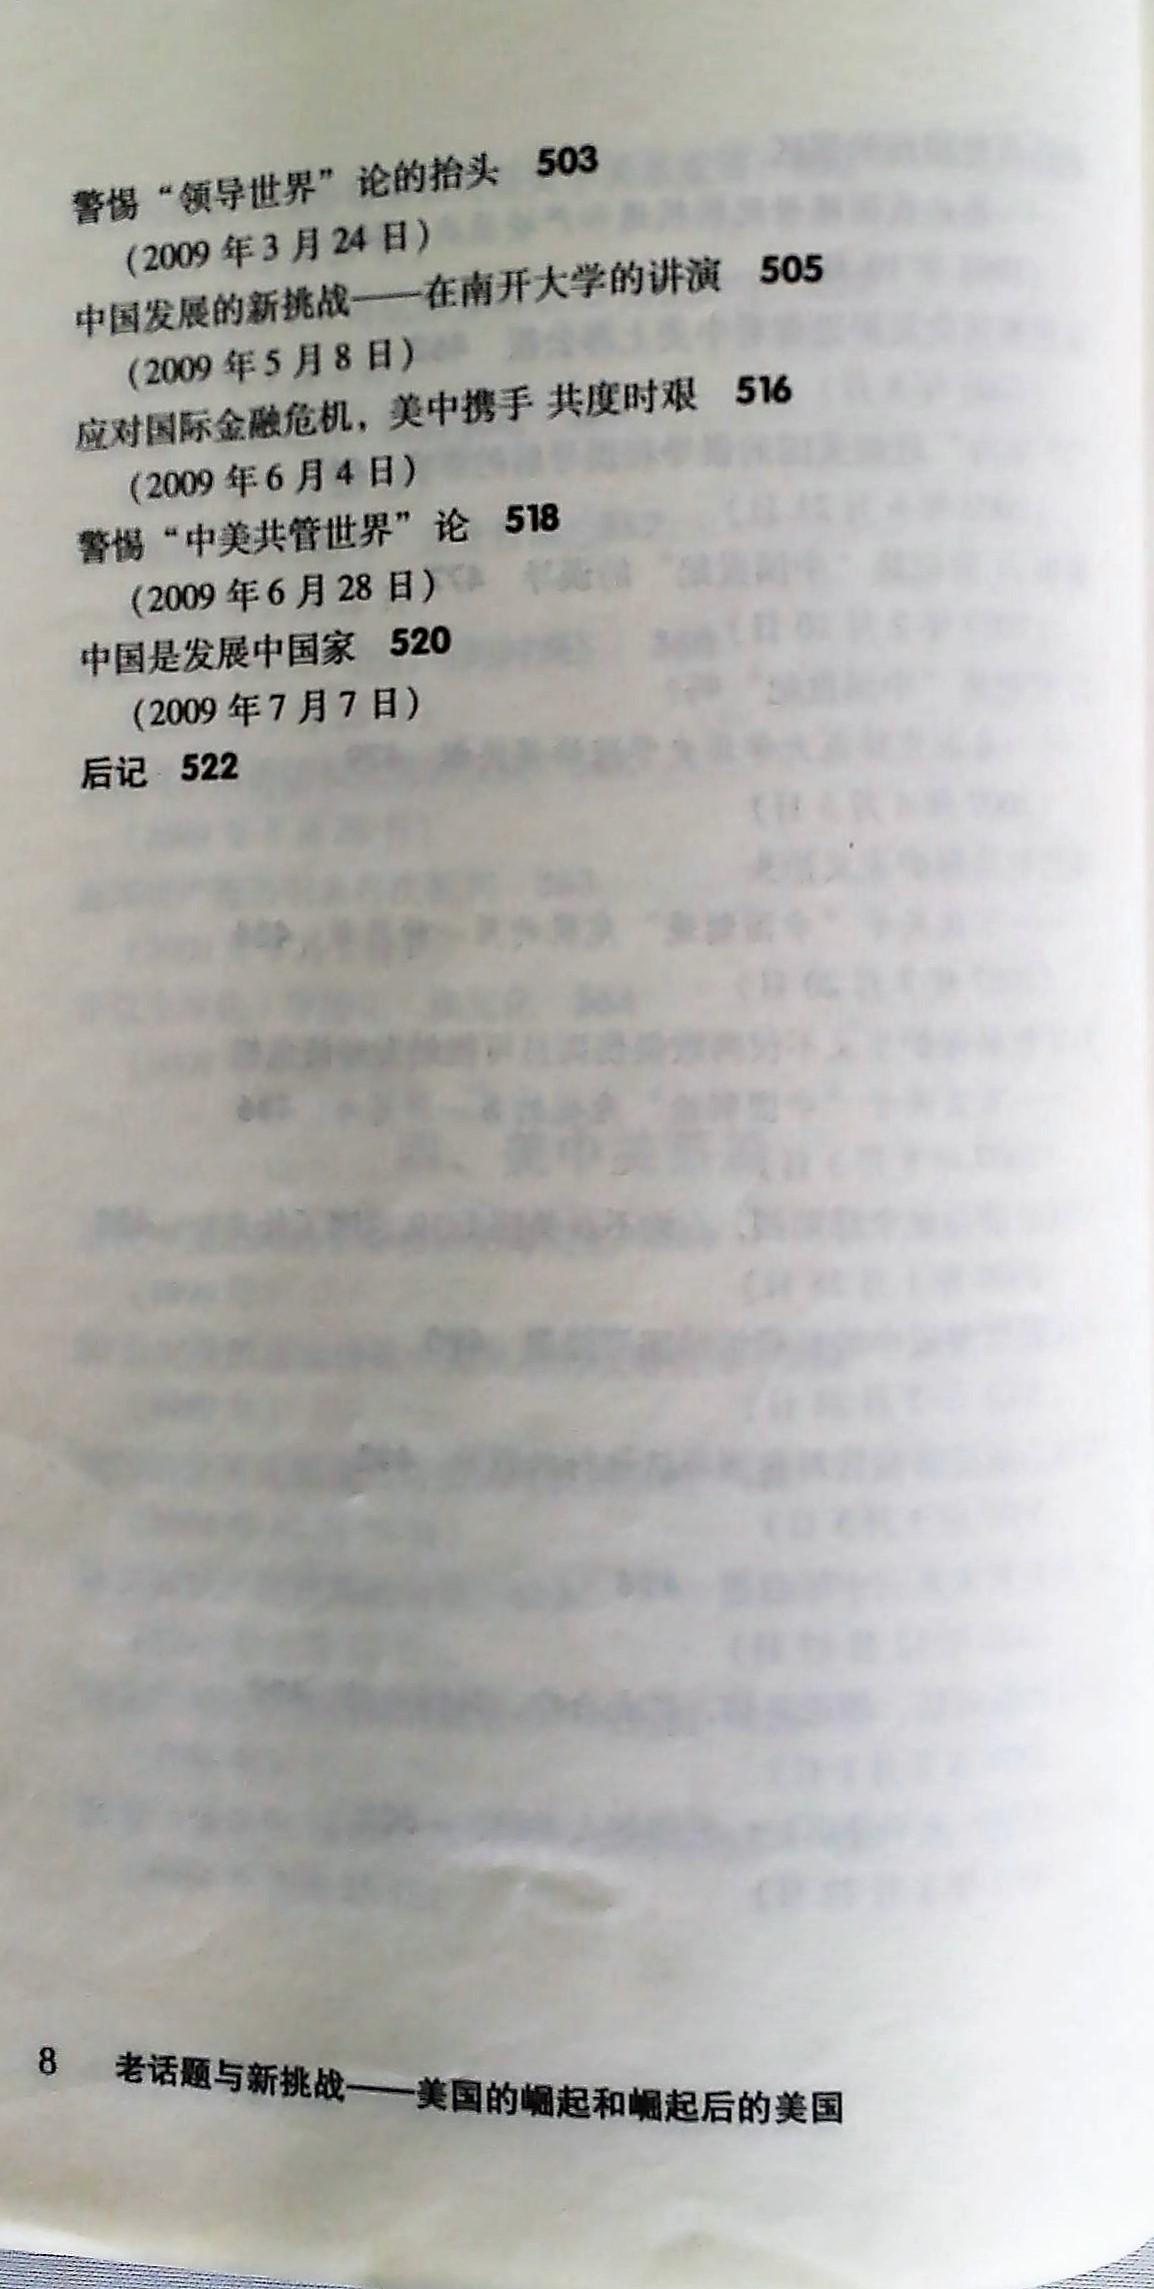 14 IMG943.jpg